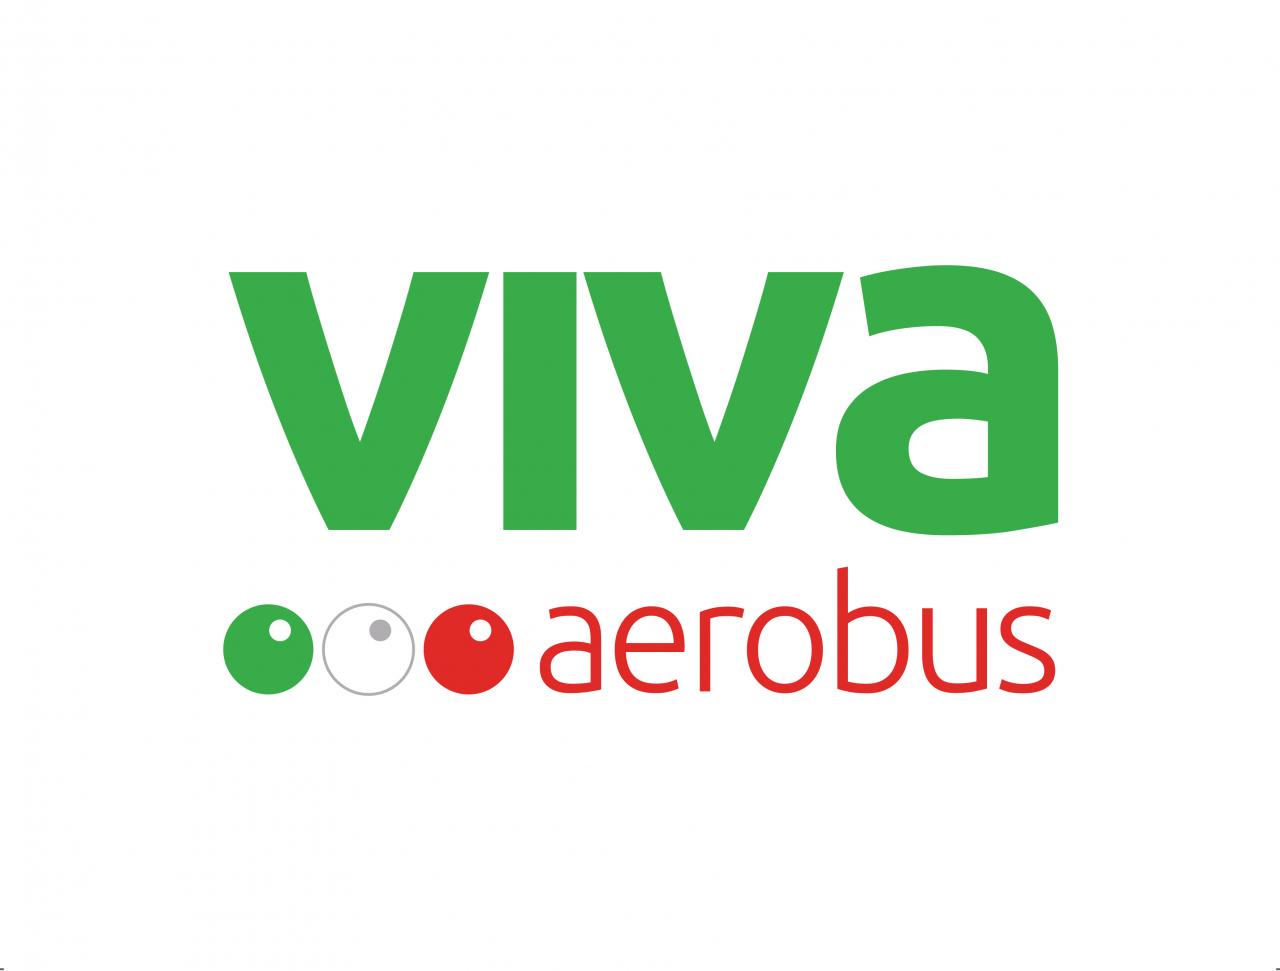 logo Vivaaerobus